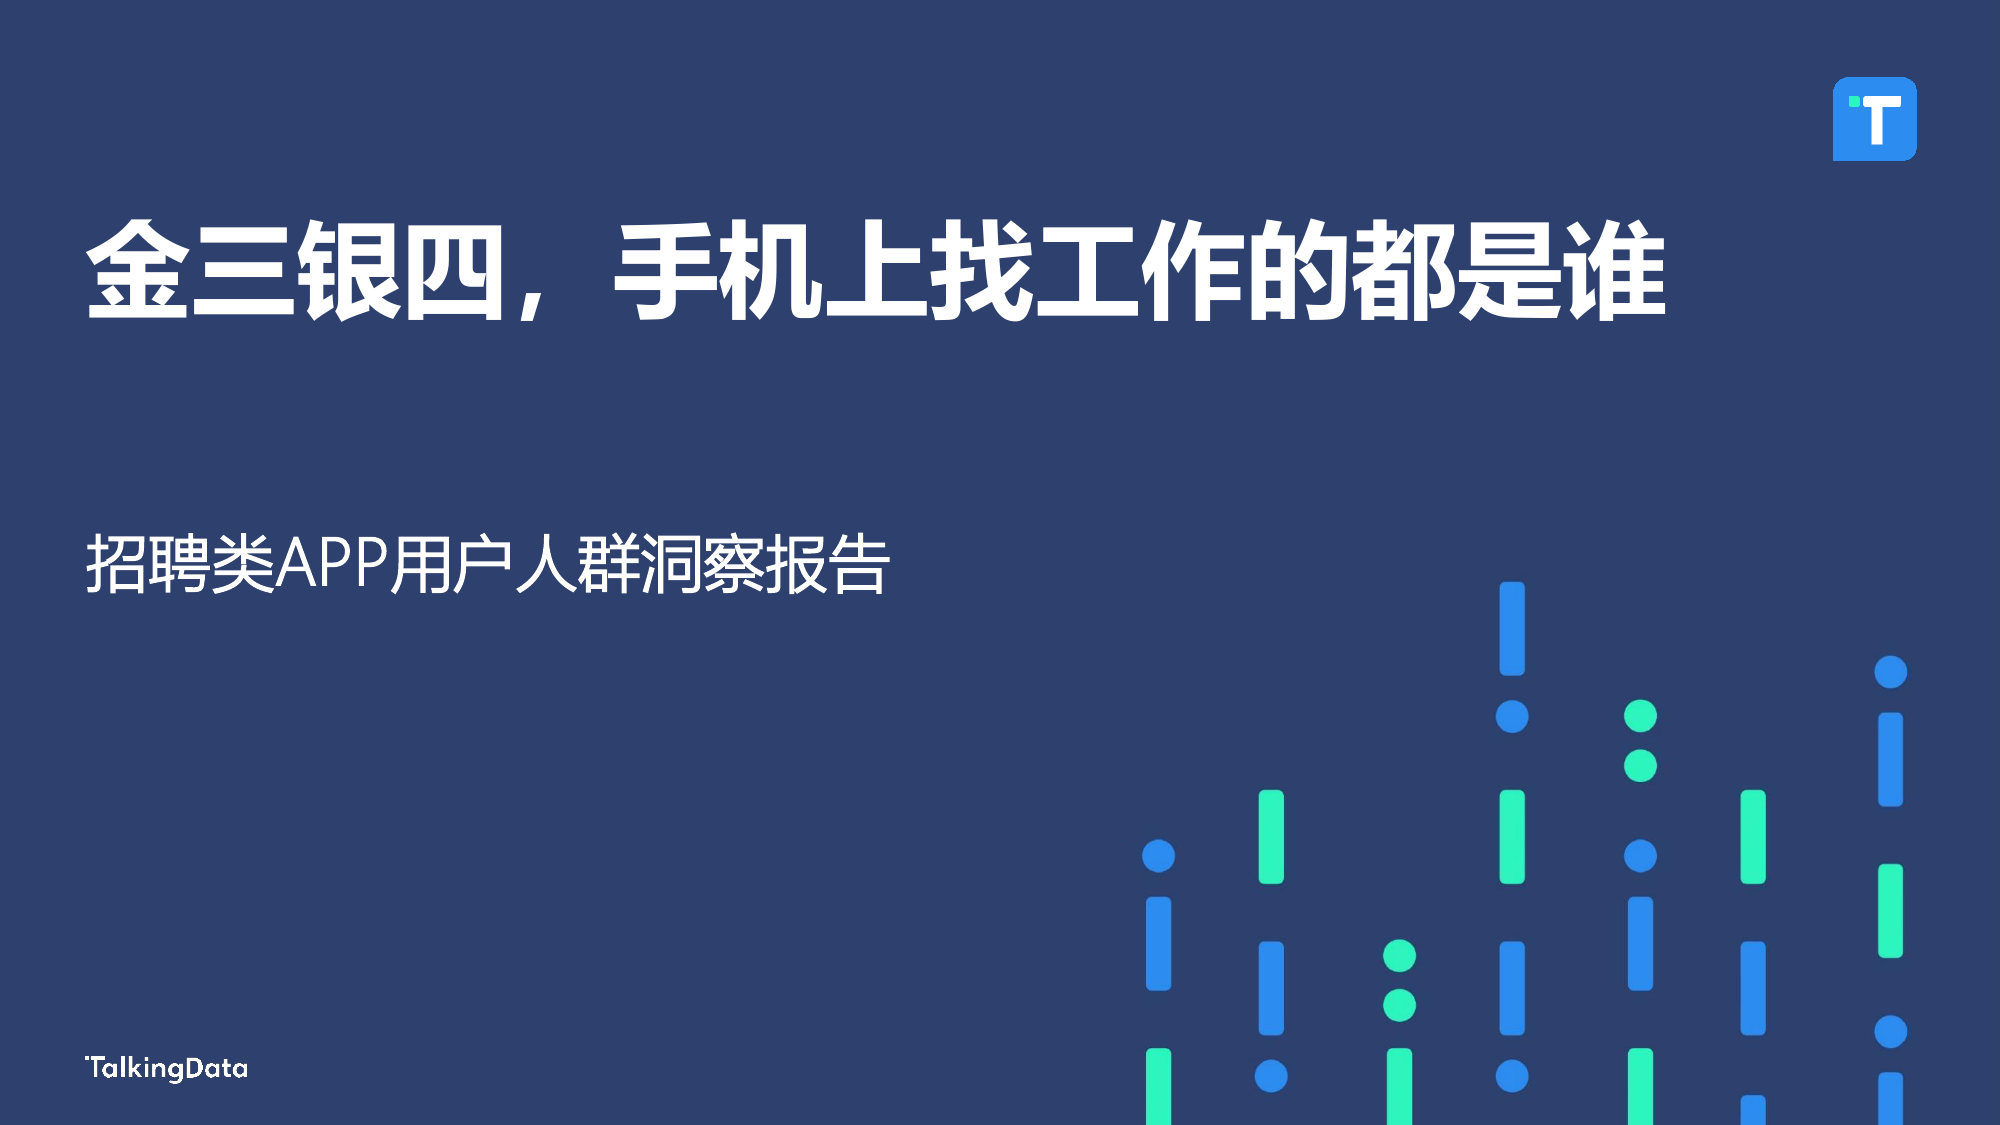 TalkingData:2018招聘类APP用户人群洞察报告(附下载)